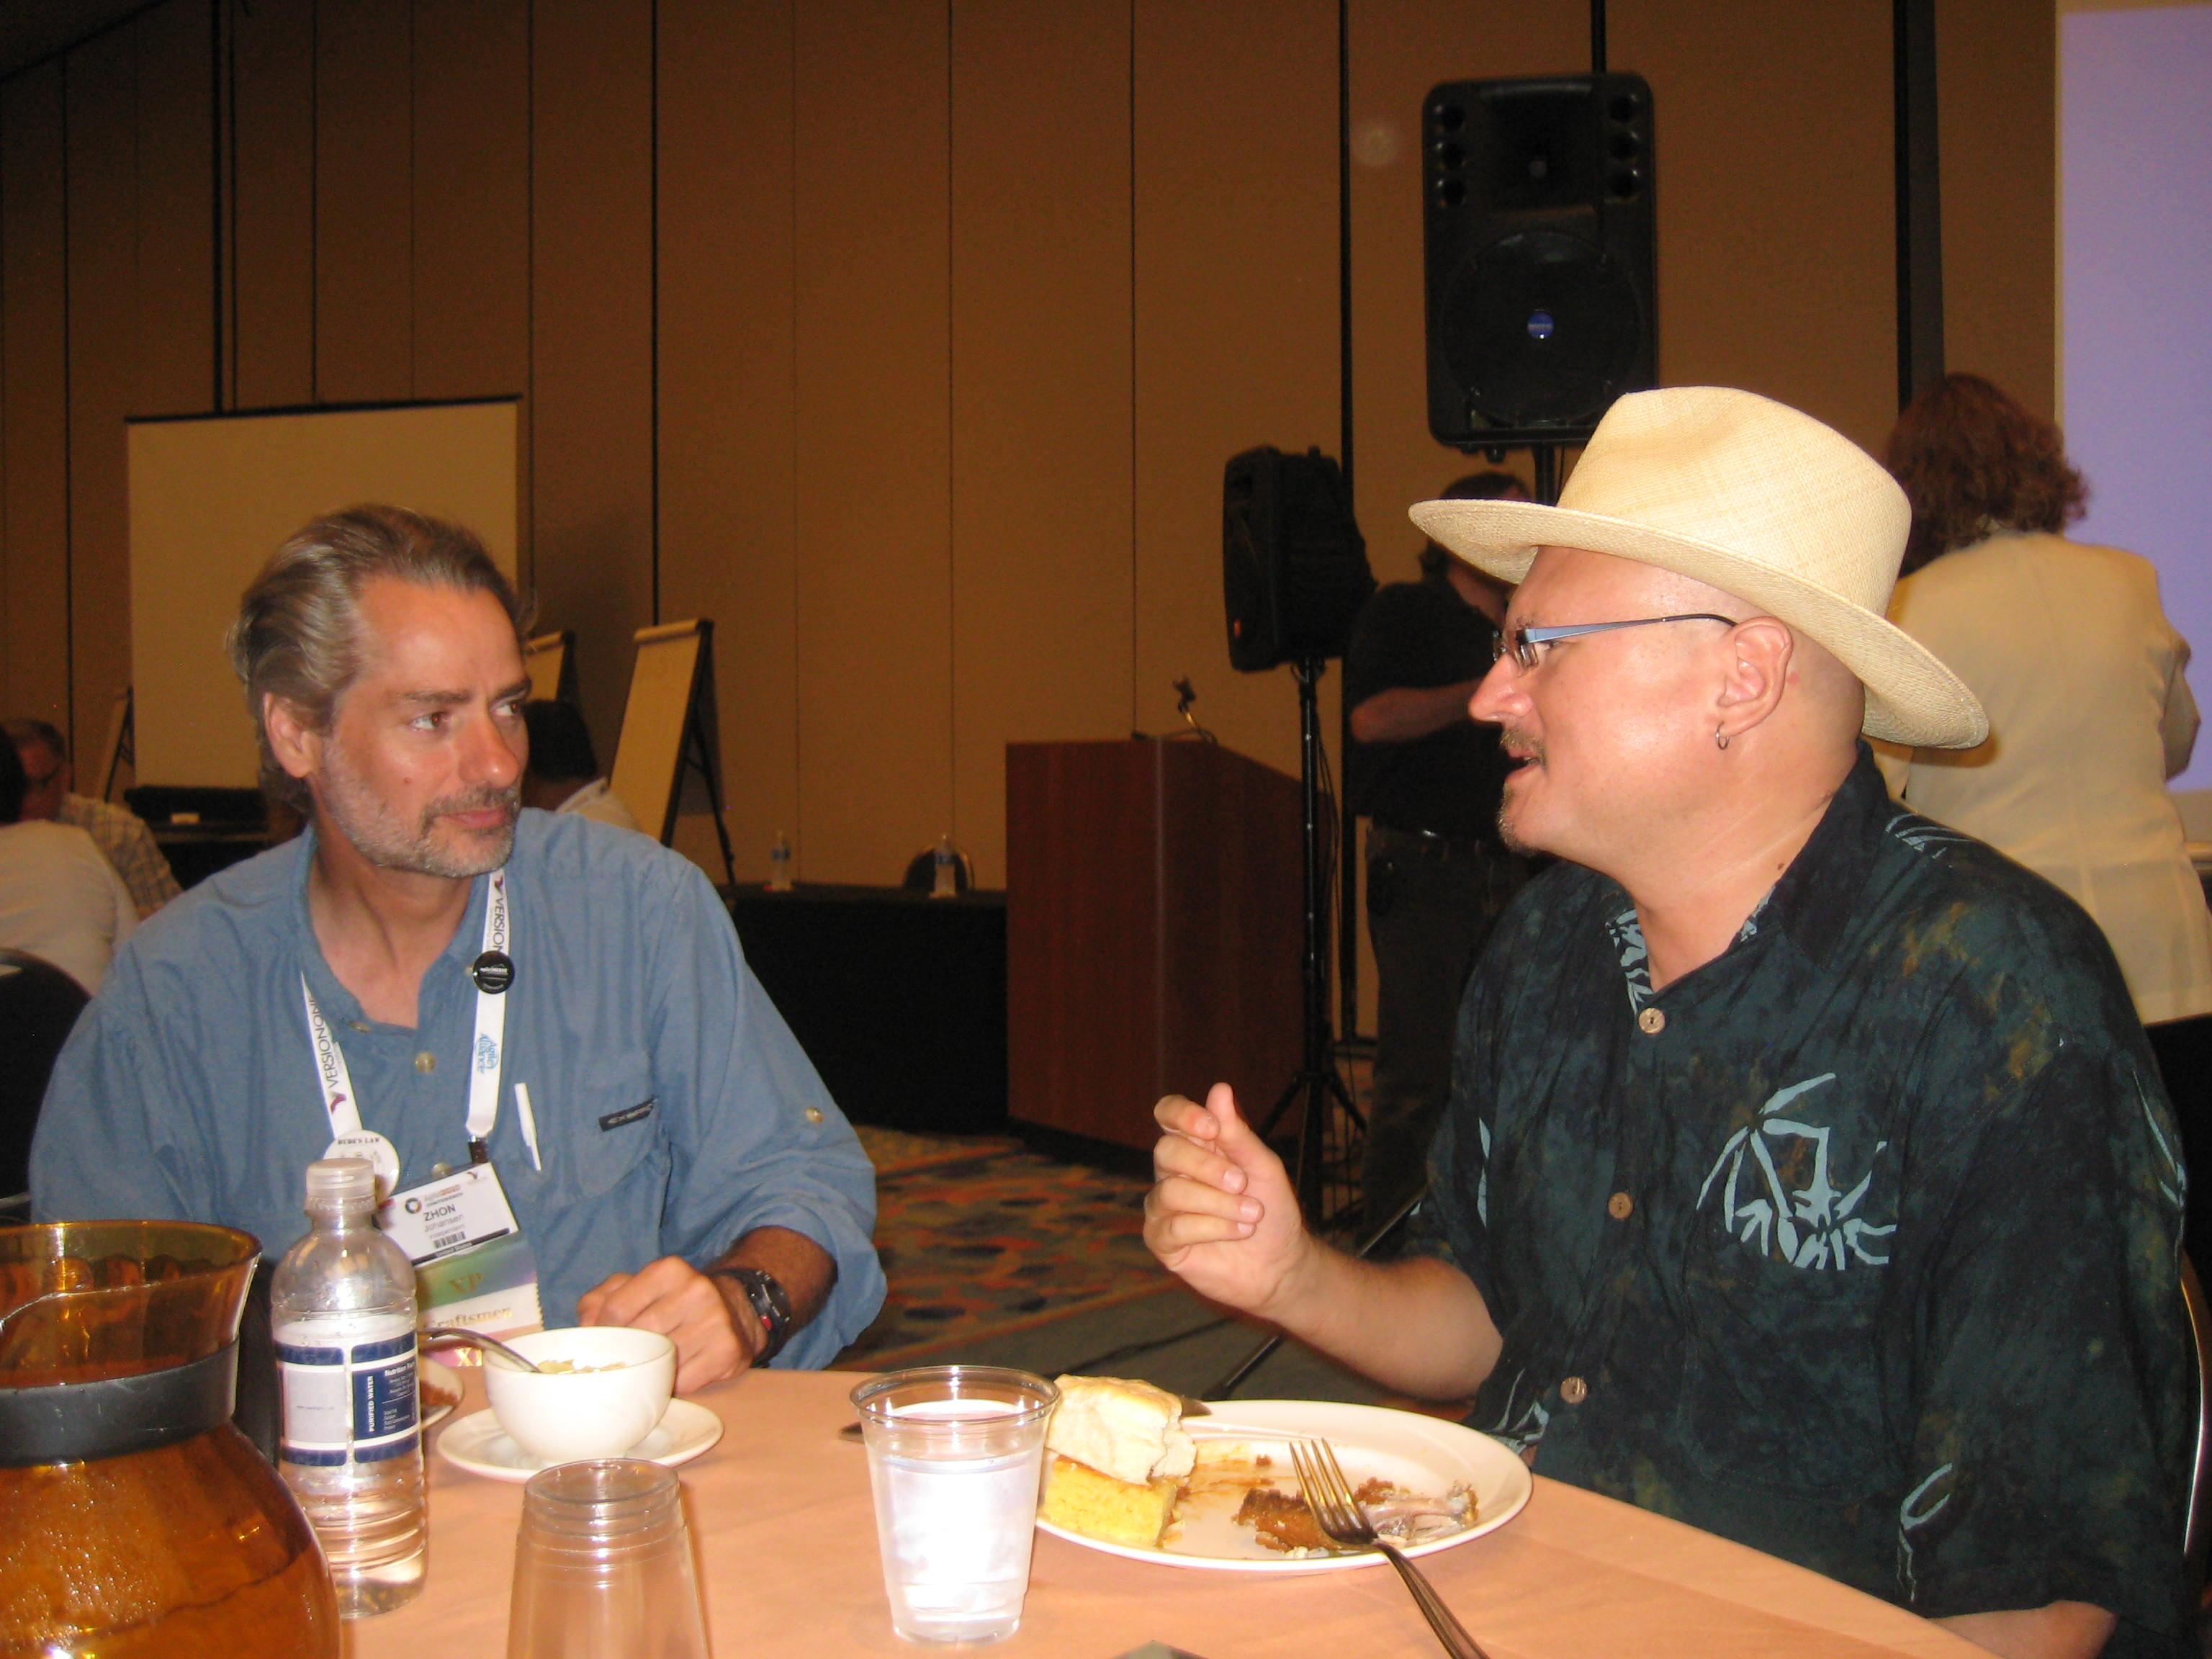 Zhon Johansen and Brian Marick